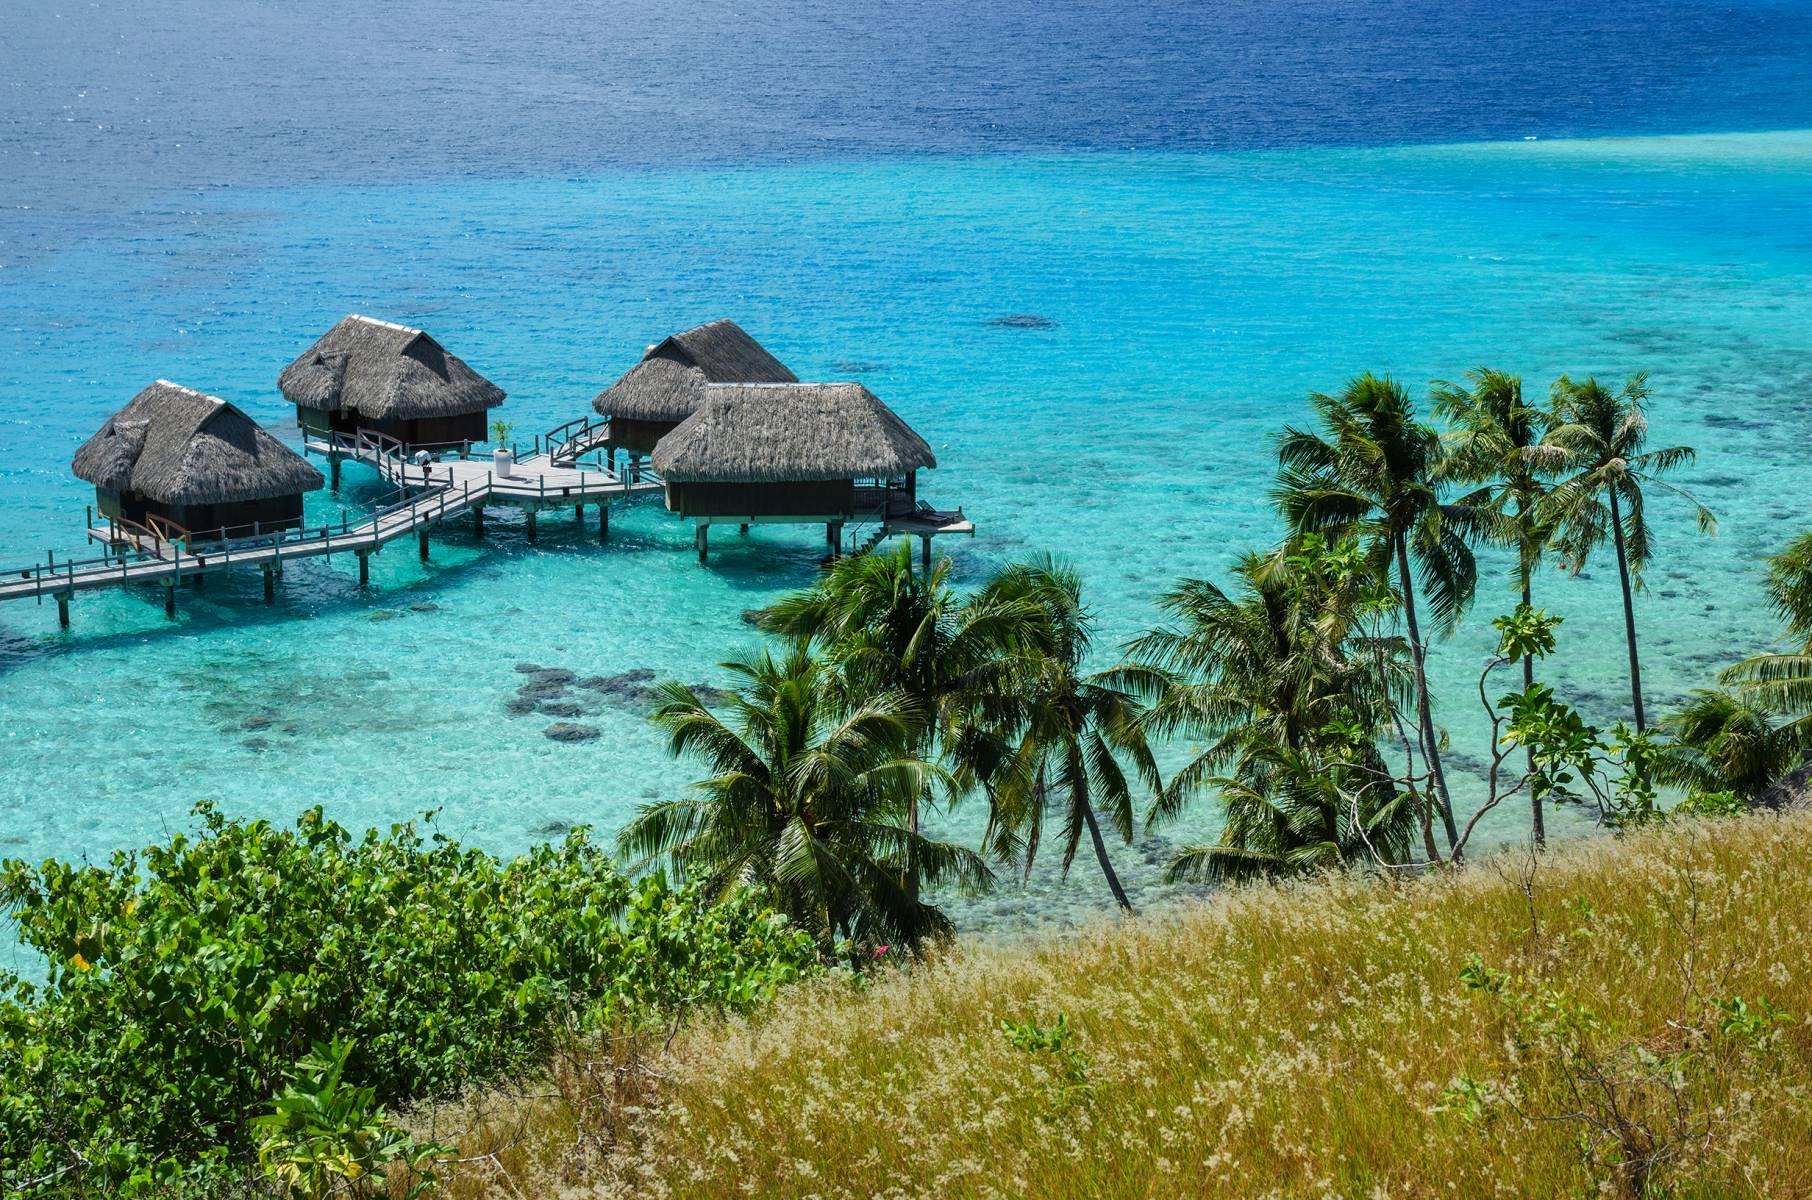 Sofitel Bora Bora Private Island Horizon Bungalow